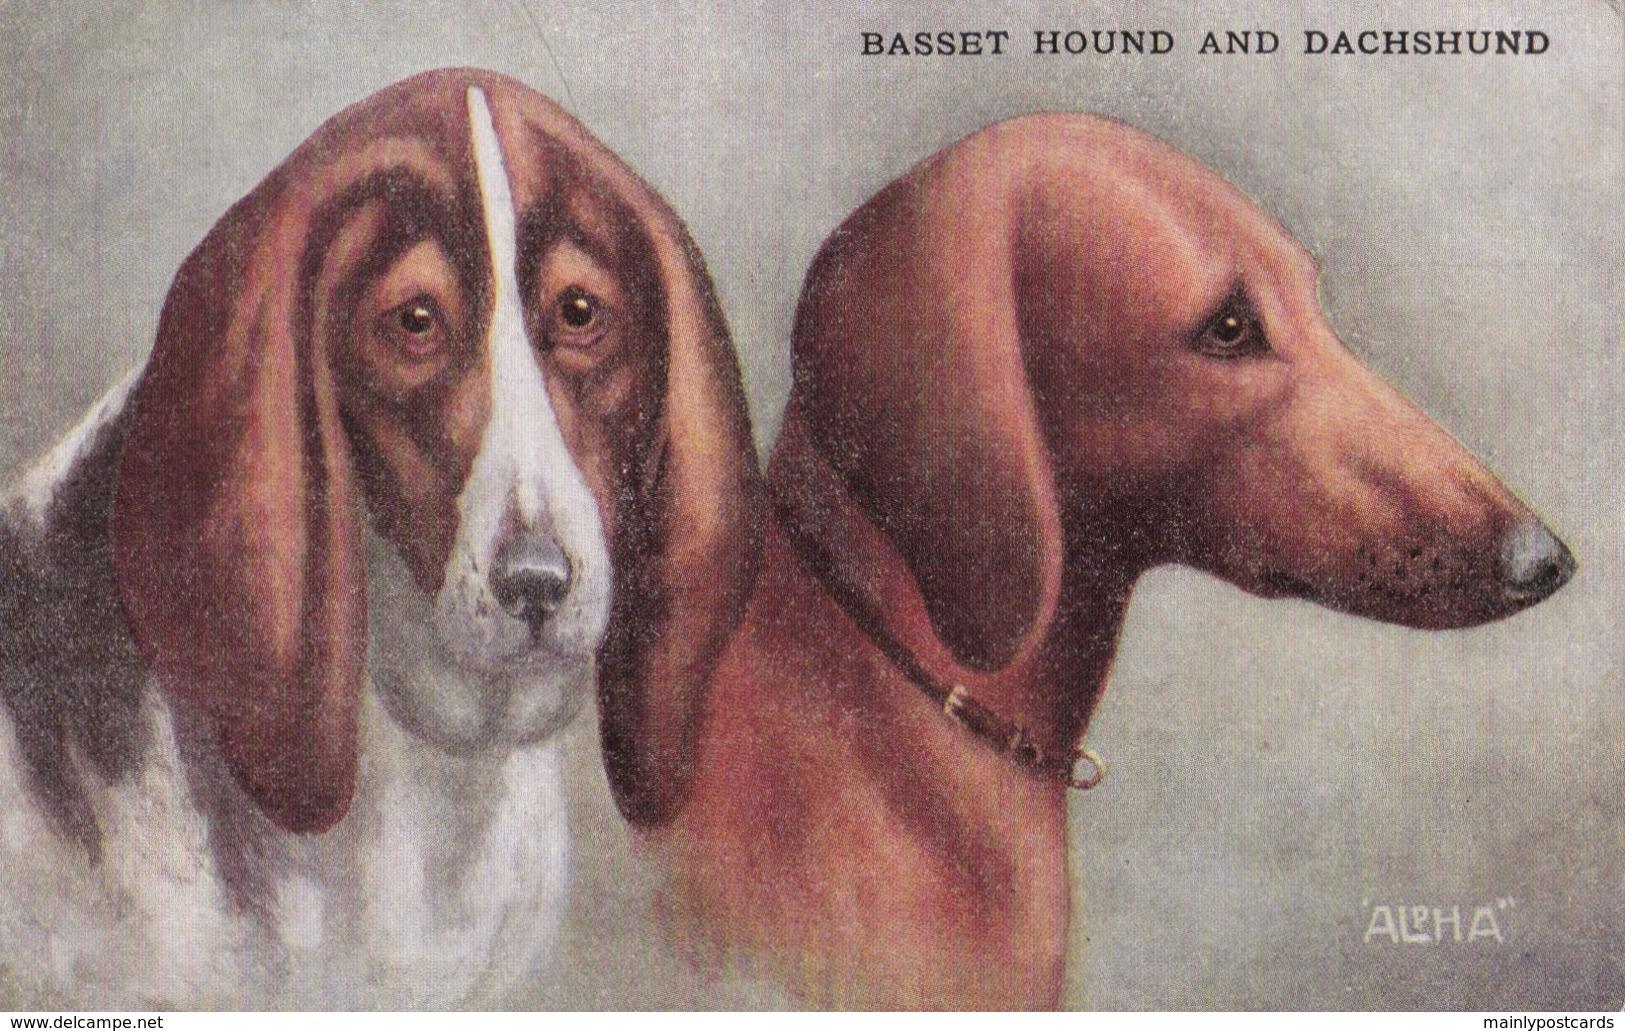 AS91 Animals - Dog - Basset Hound And Dachshund - Dogs